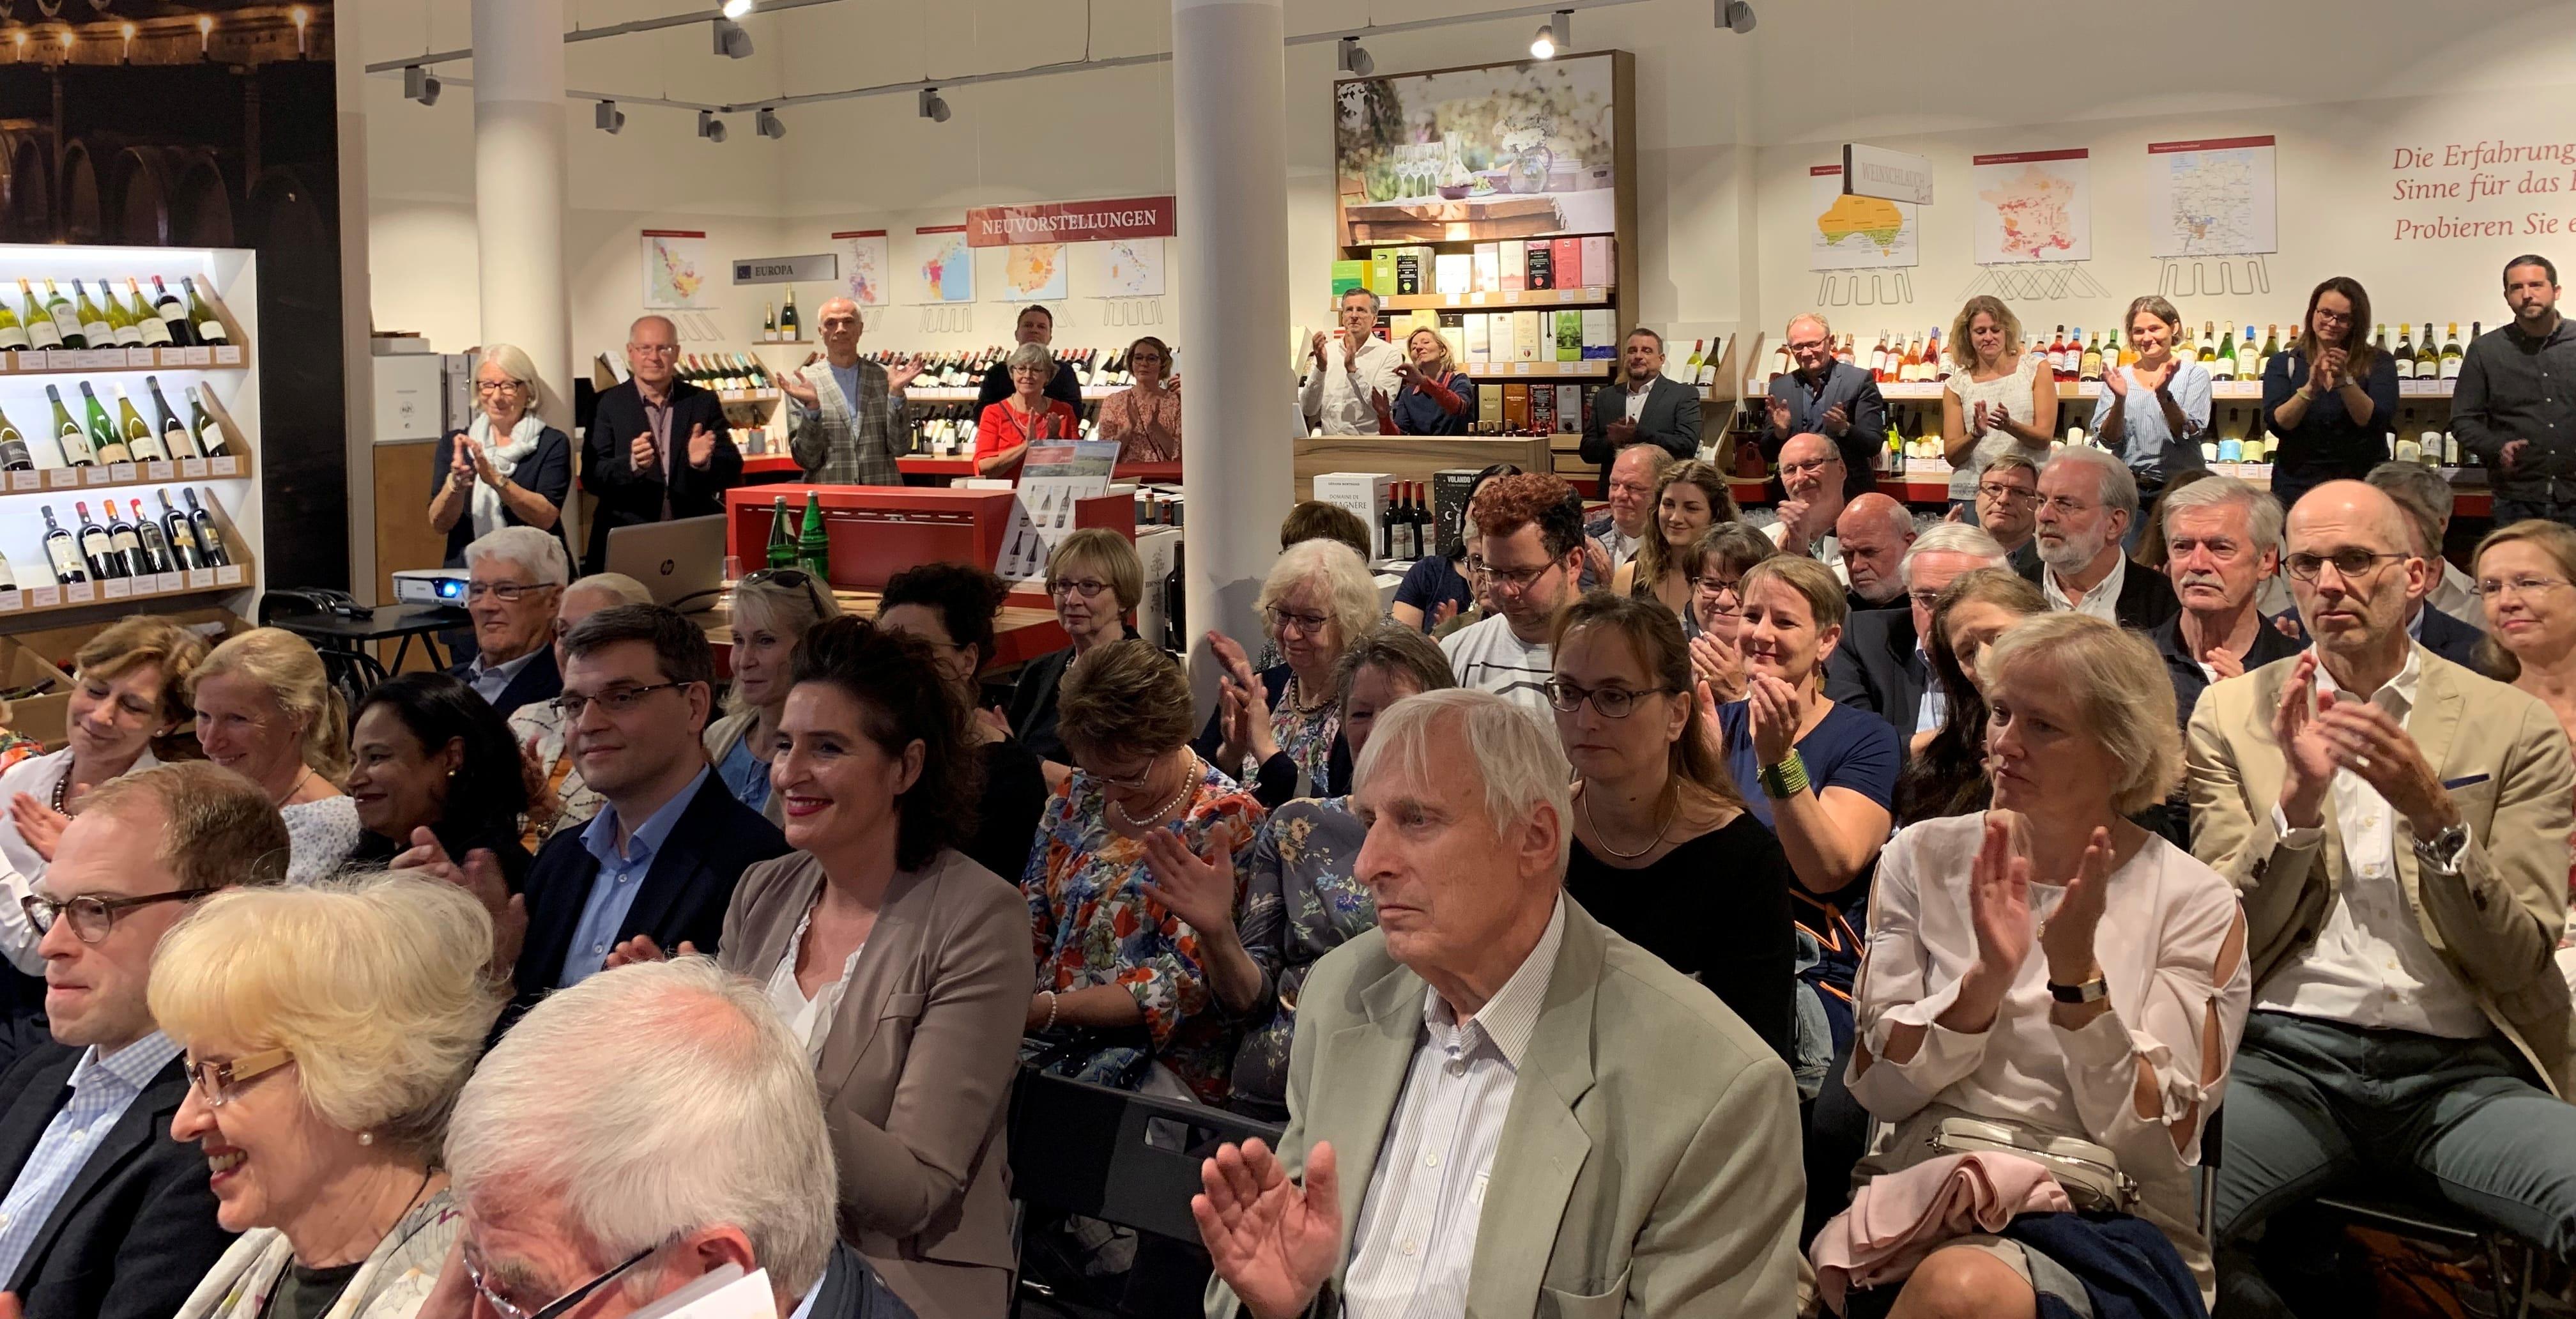 GK-Kaiserswerth - Blick ins Gäste Forum